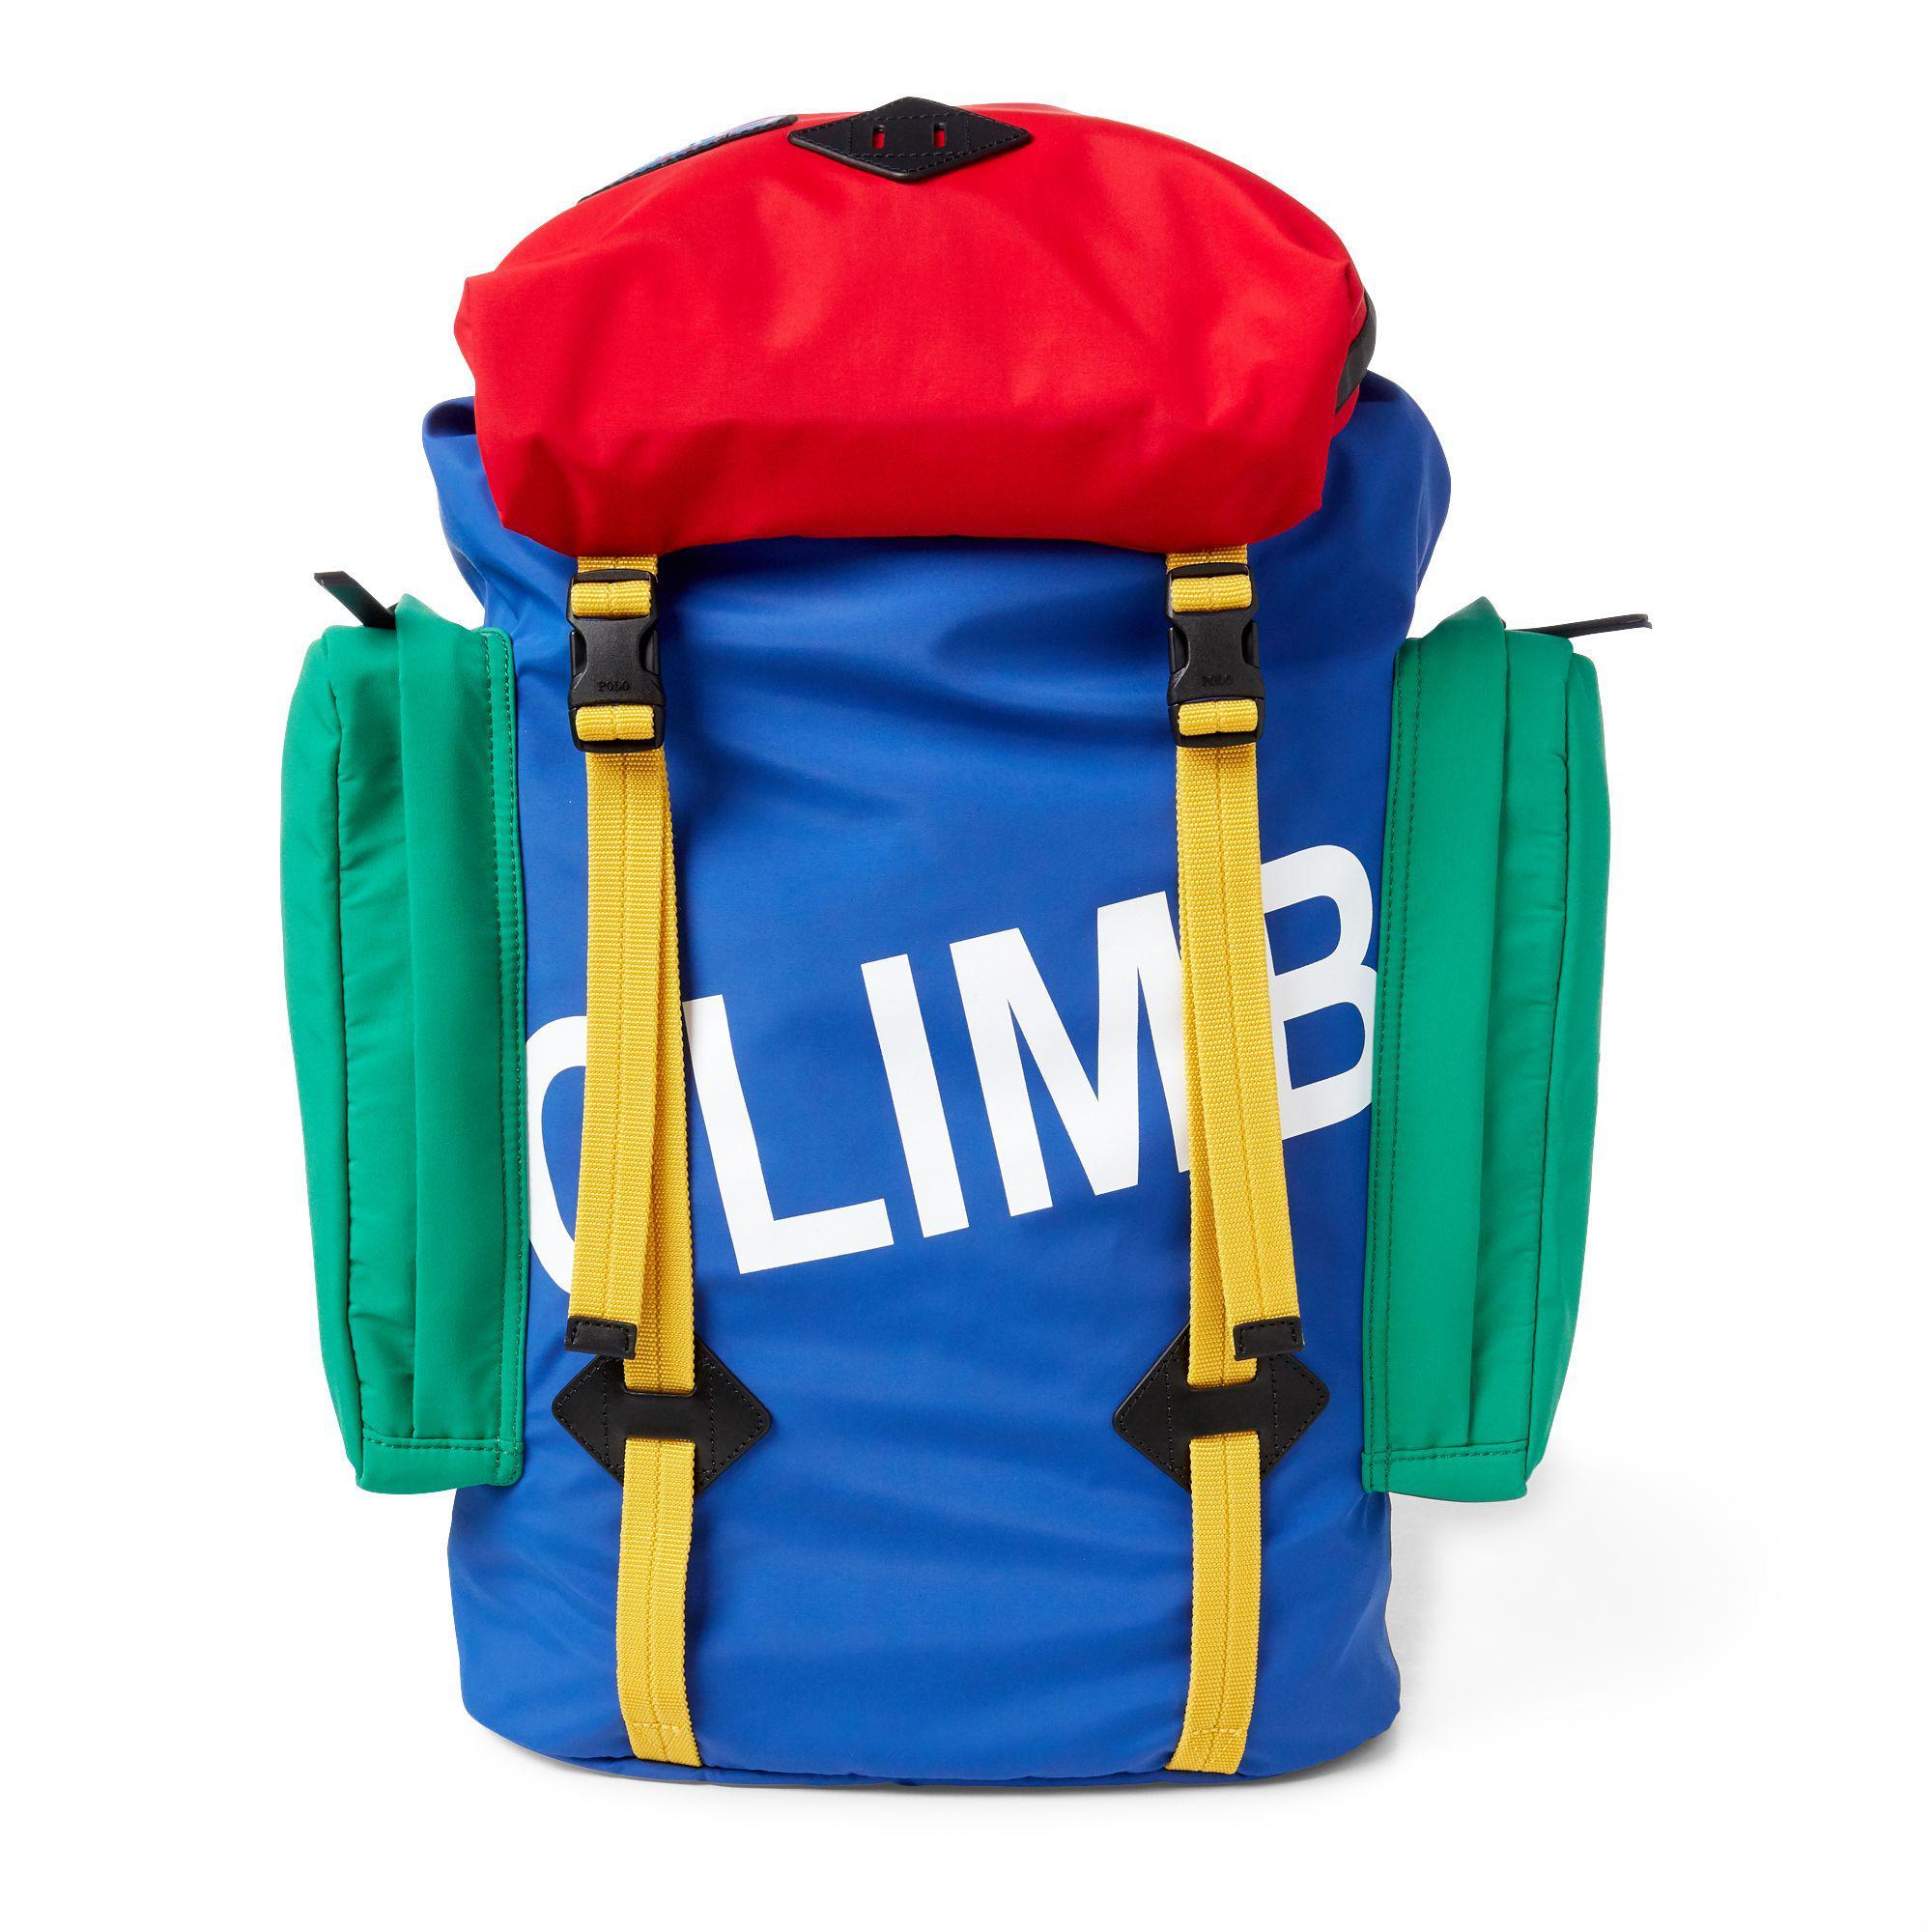 7fb945dc7cdc Polo Ralph Lauren Hi Tech Backpack in Blue for Men - Lyst